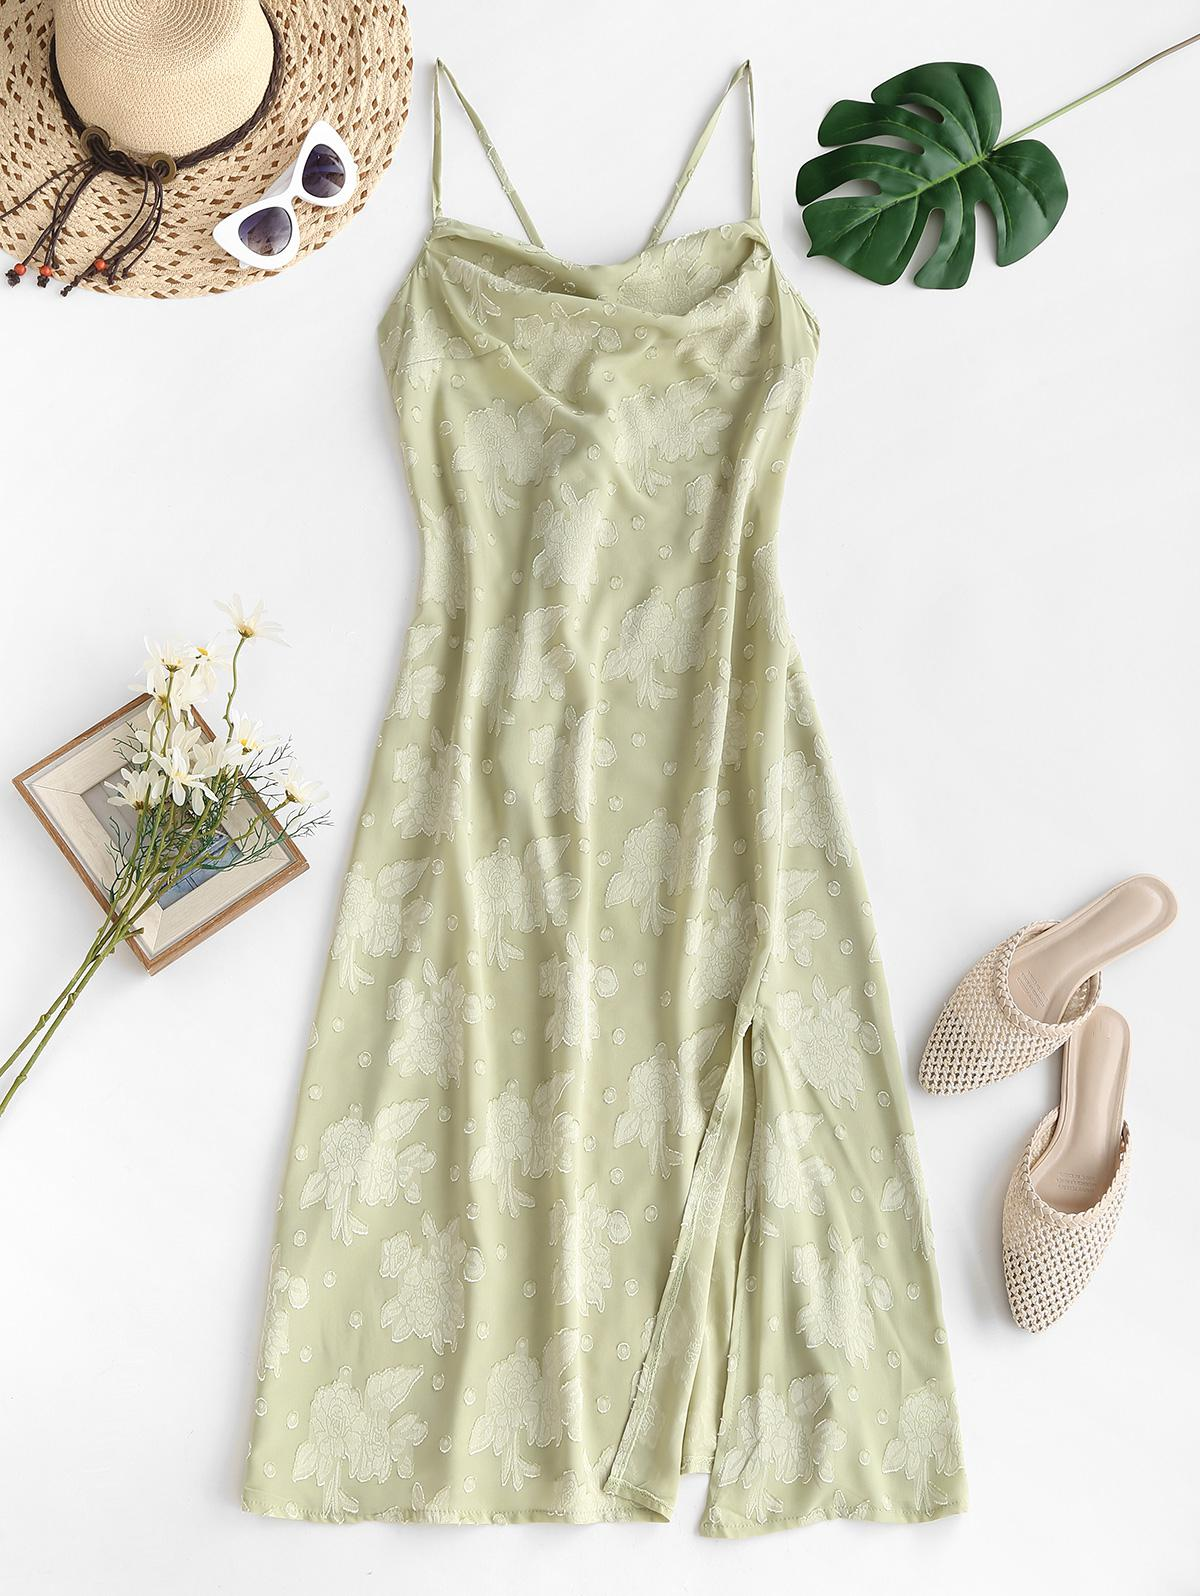 Cowl Neck Floral Jacquard Lace-up Backless Split Hem Midi Dress